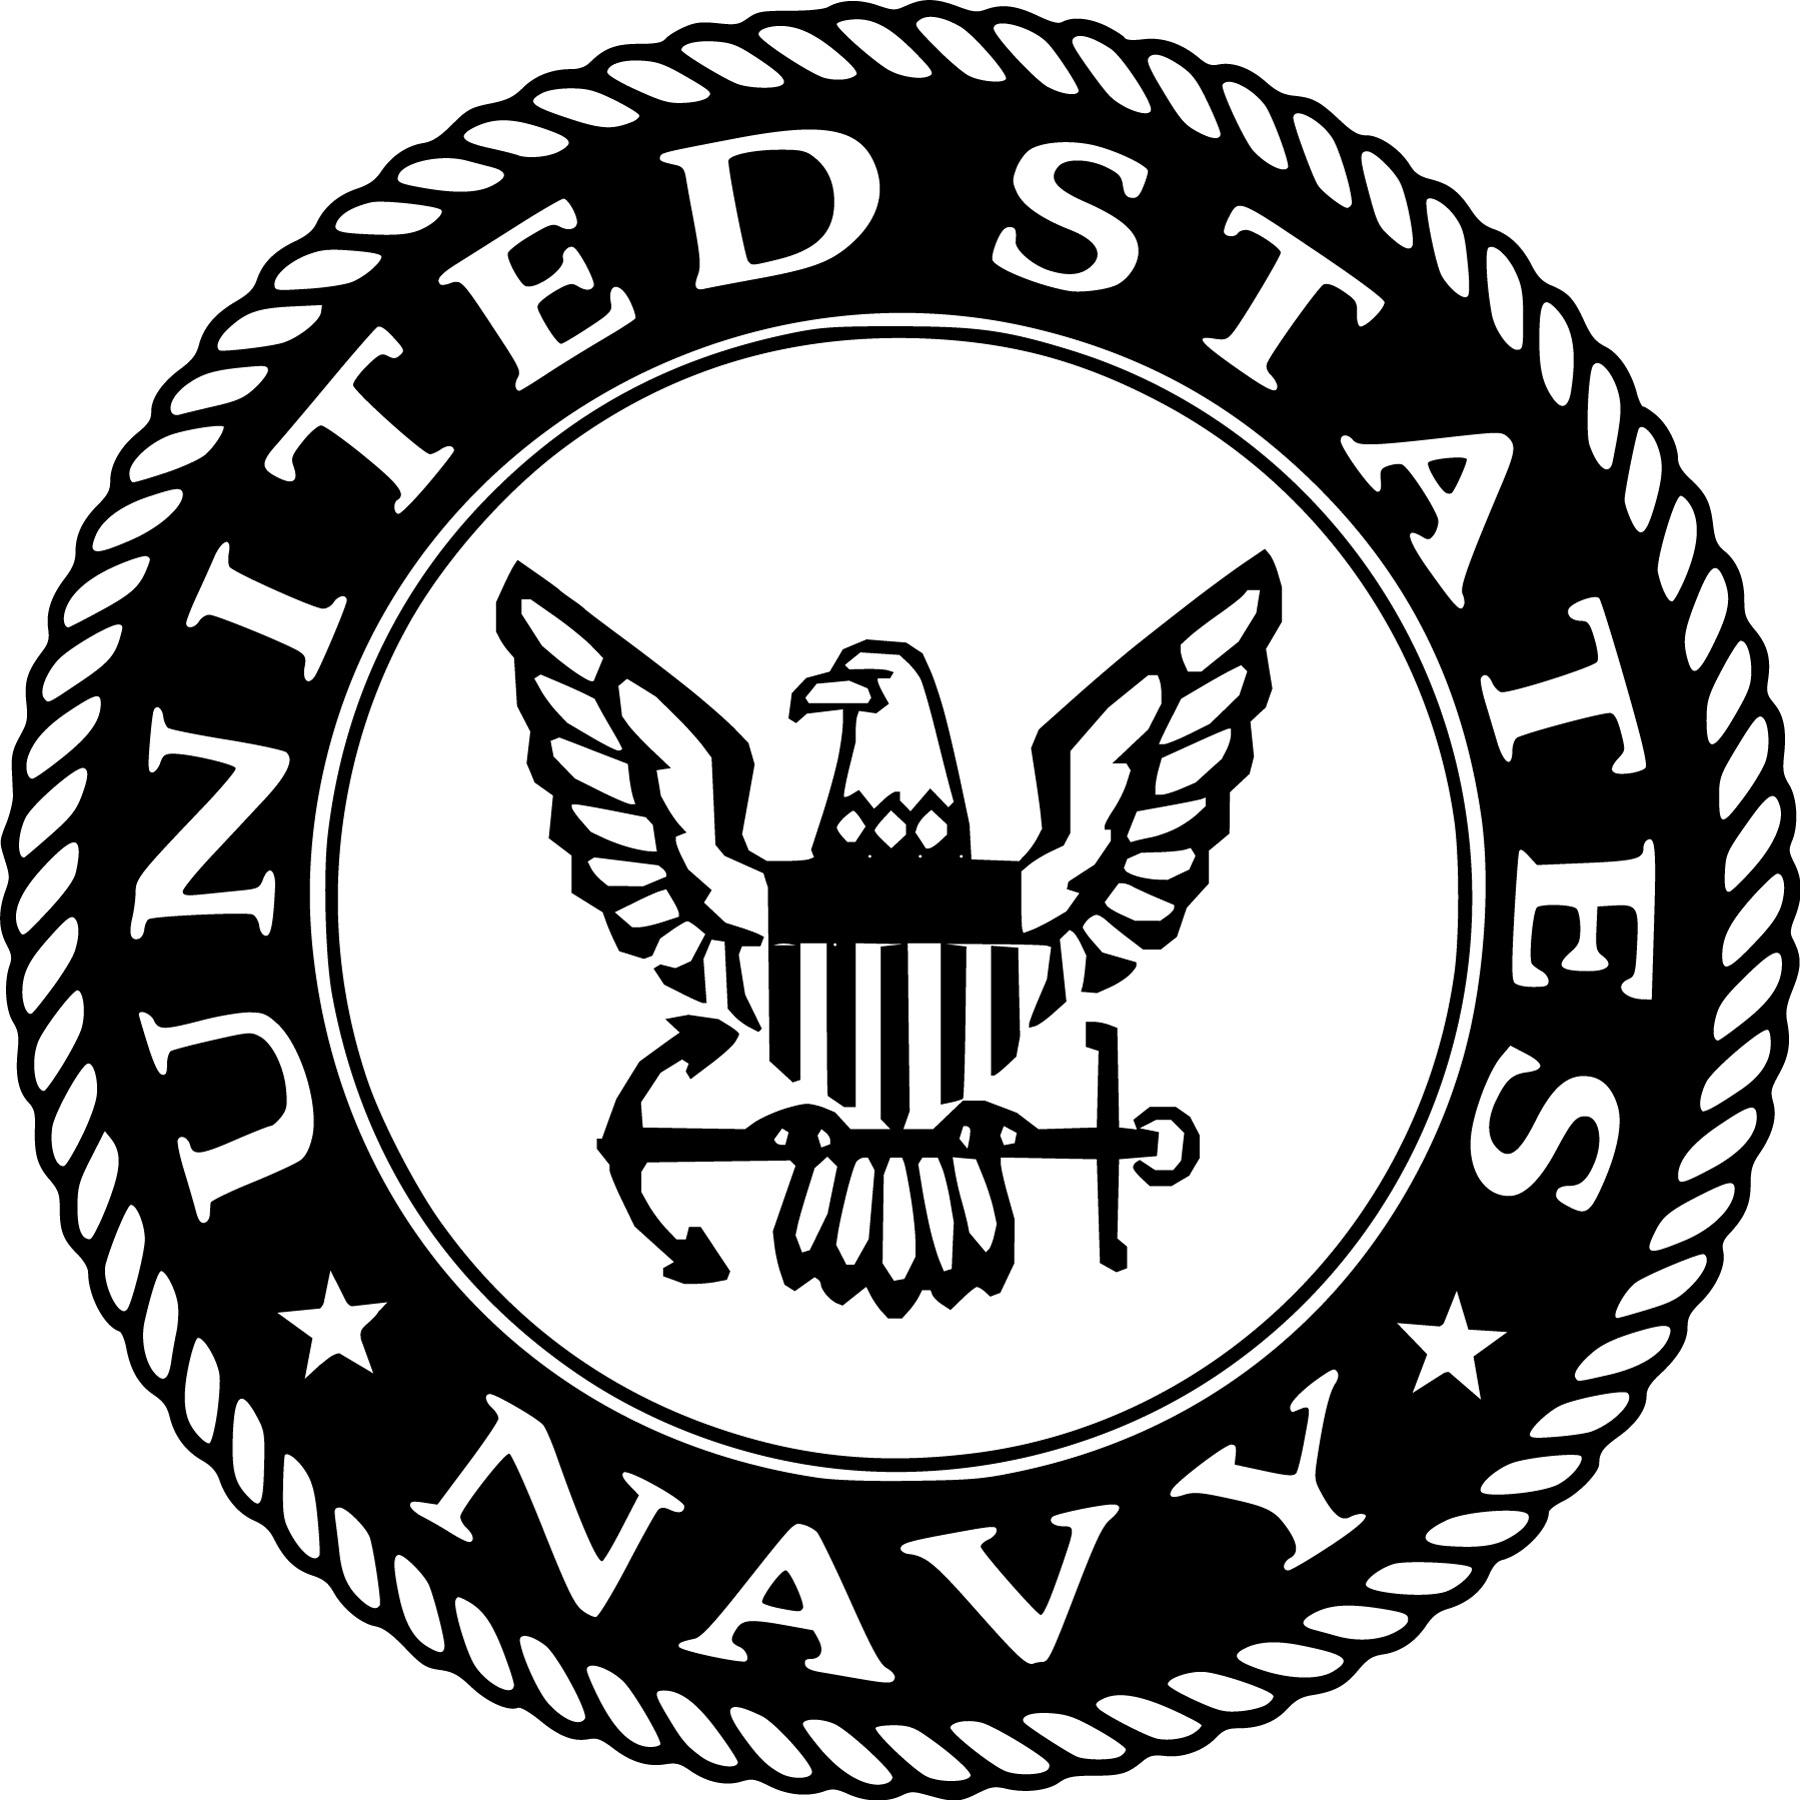 navy.jpg?time=1606687013